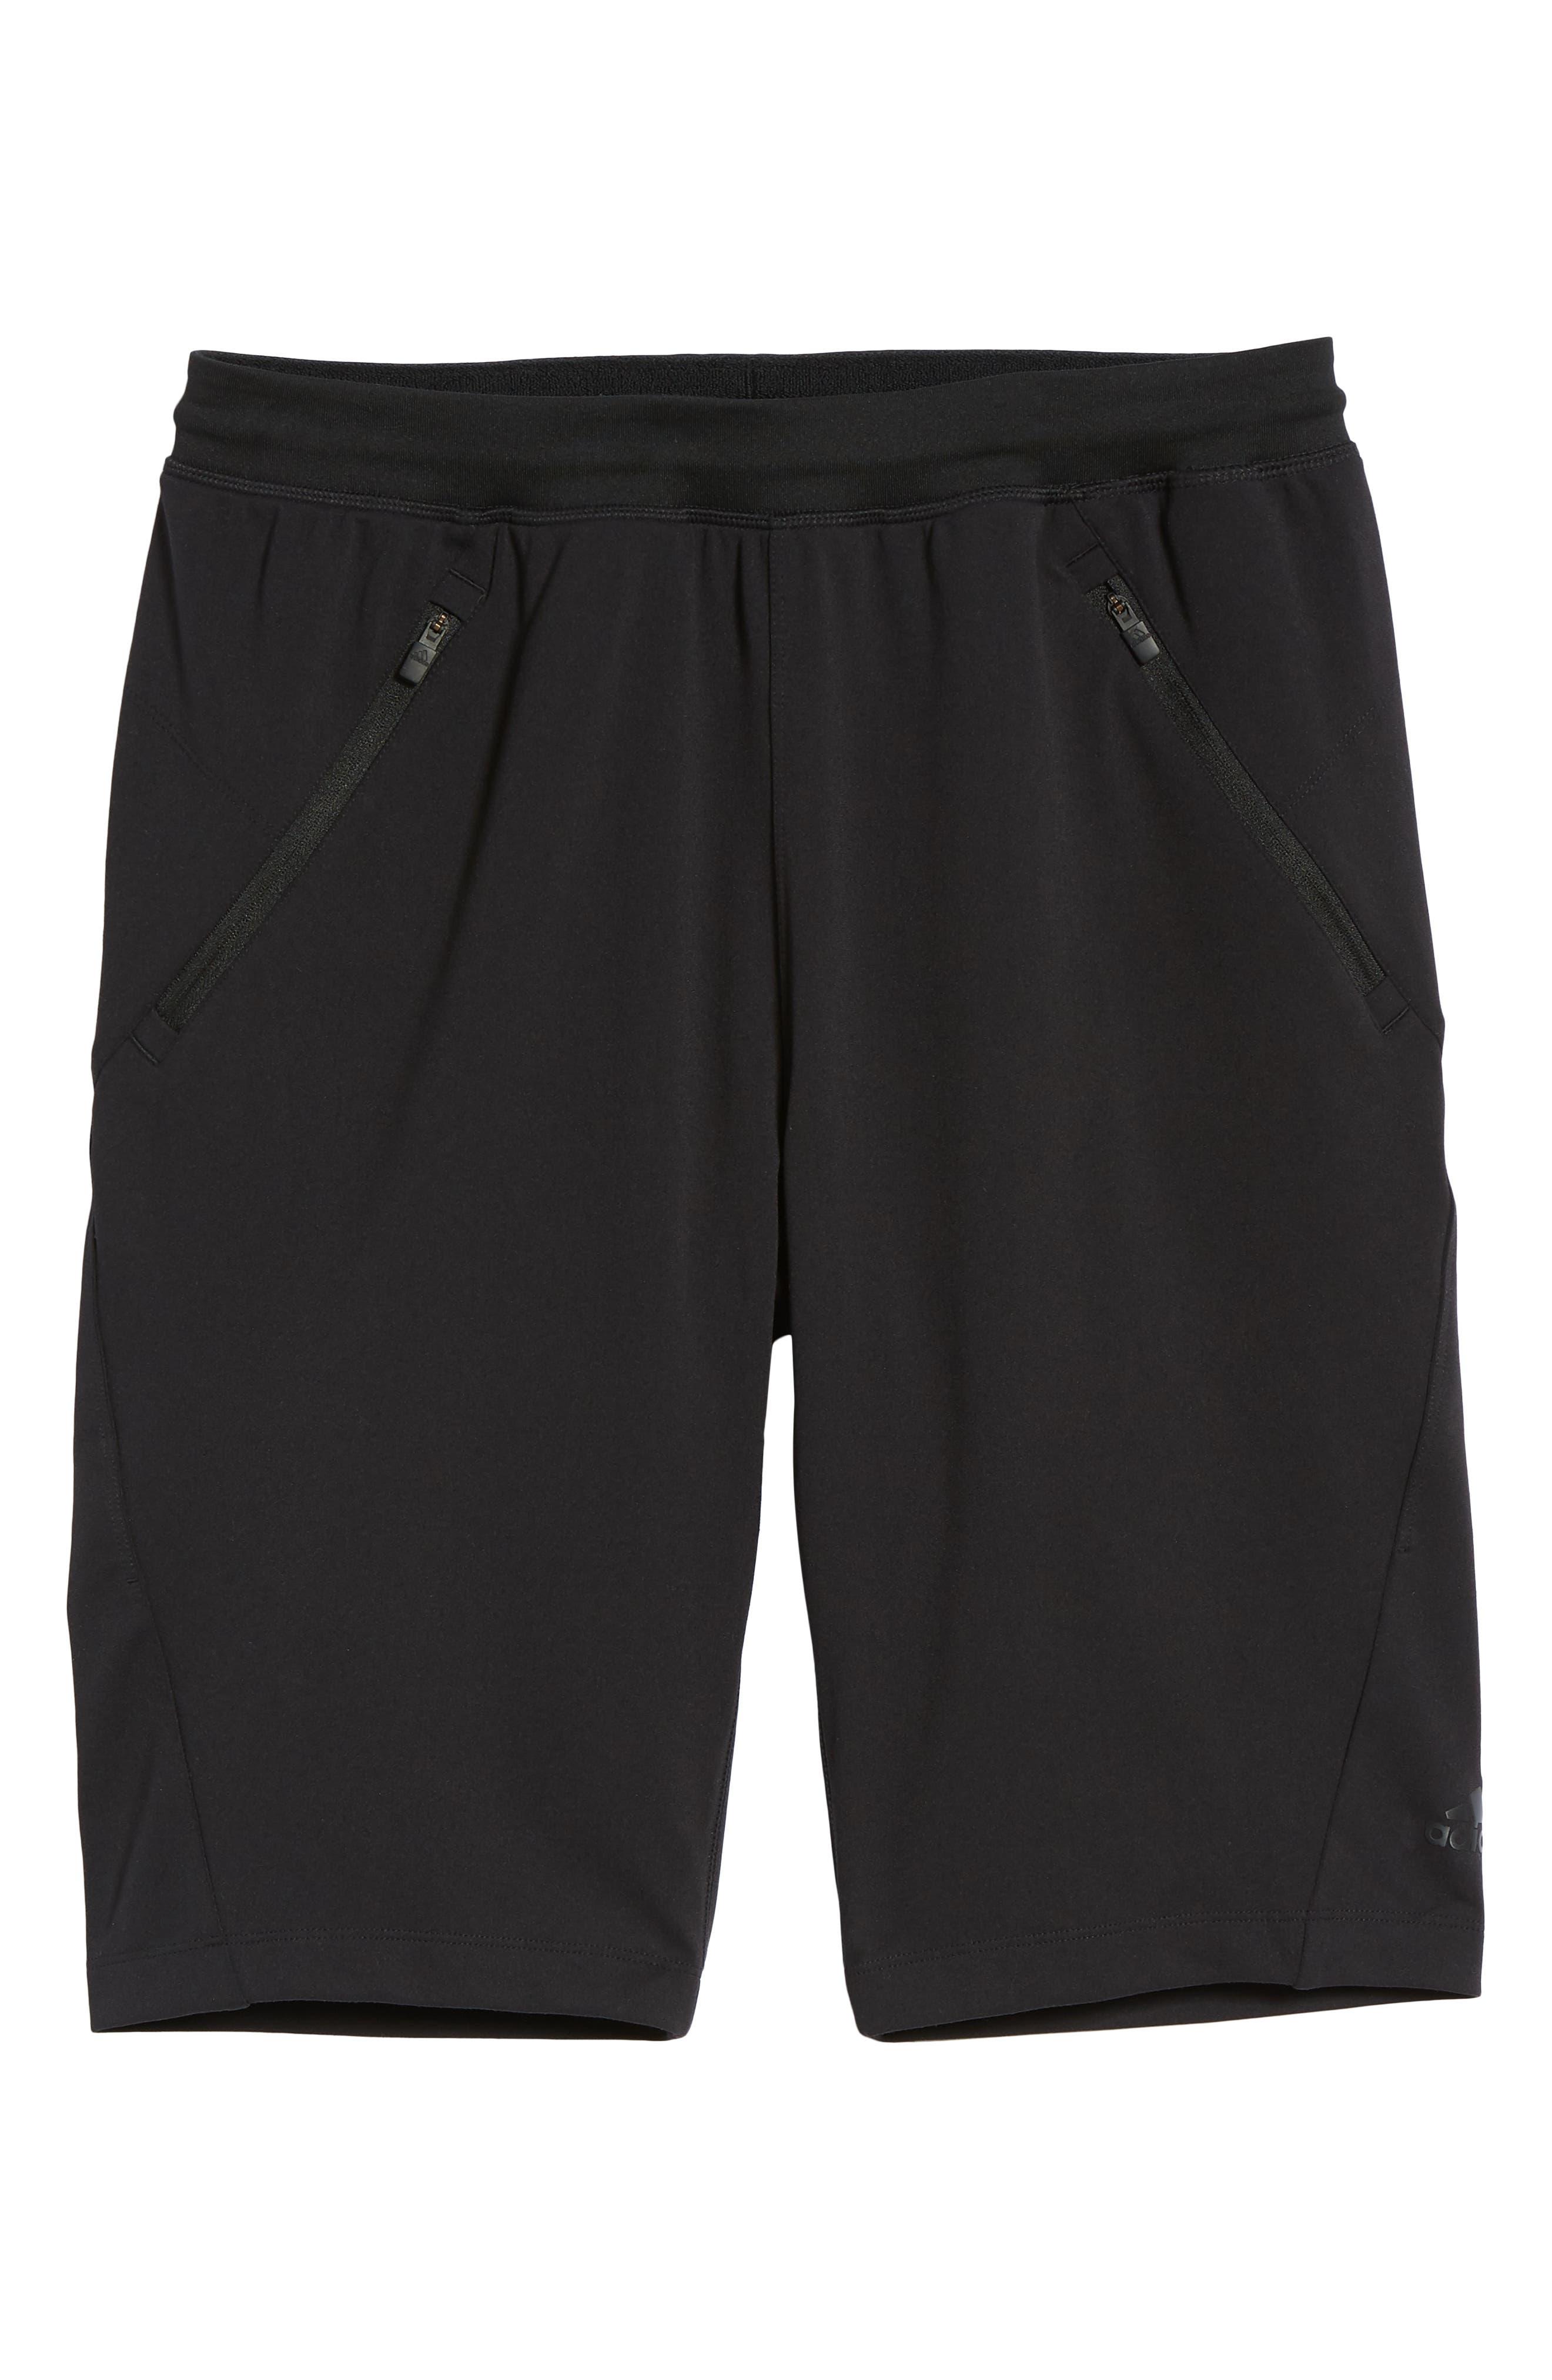 Ultimate Transitional Regular Fit Shorts,                             Alternate thumbnail 6, color,                             001